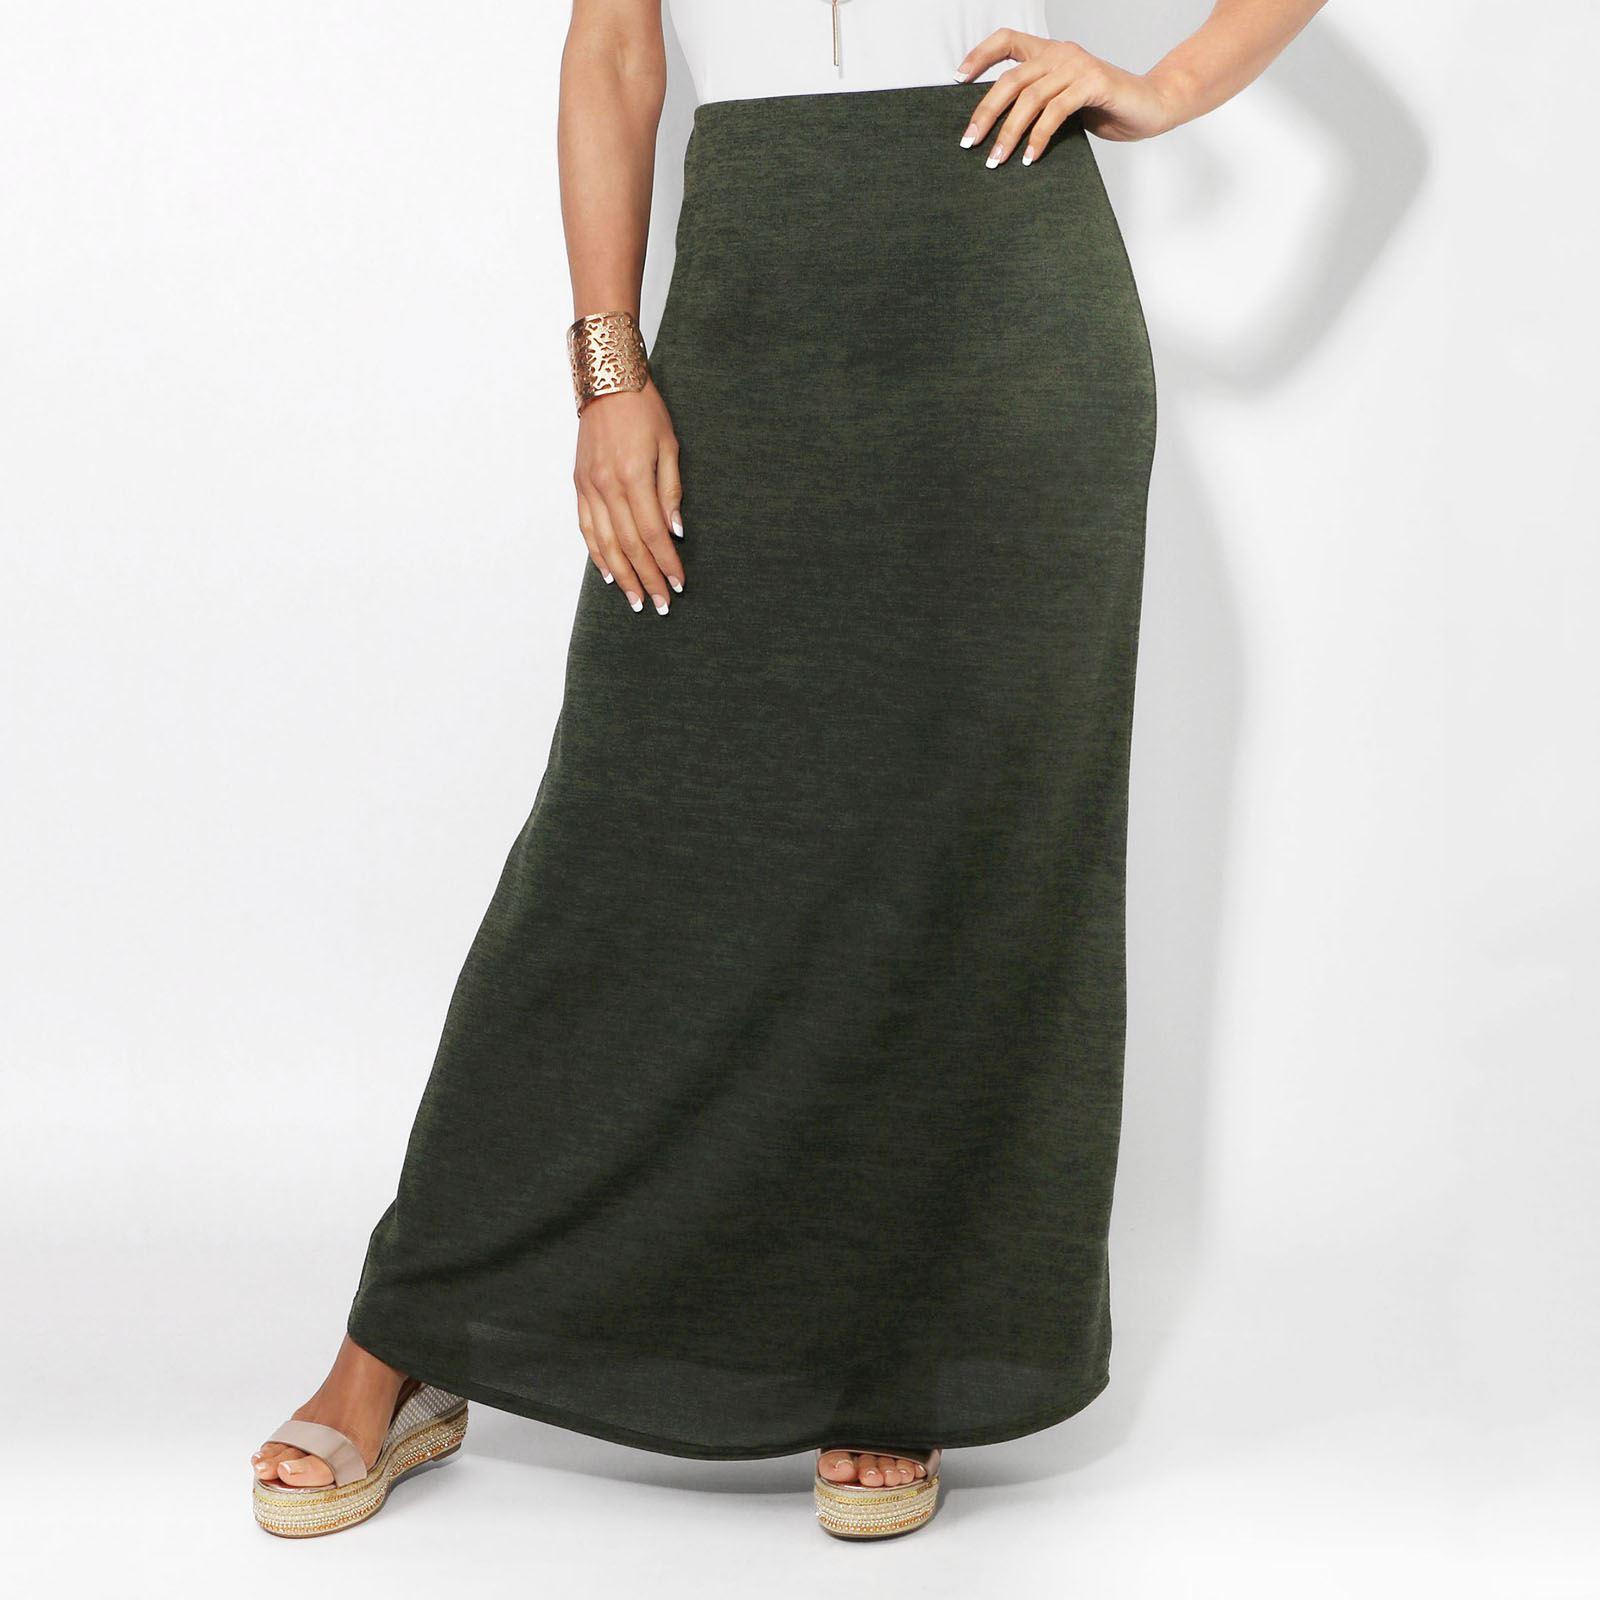 Womens-Ladies-Maxi-Skirt-High-Waist-A-Line-Long-Knit-Stretch-Bodycon-Casual-Boho thumbnail 11